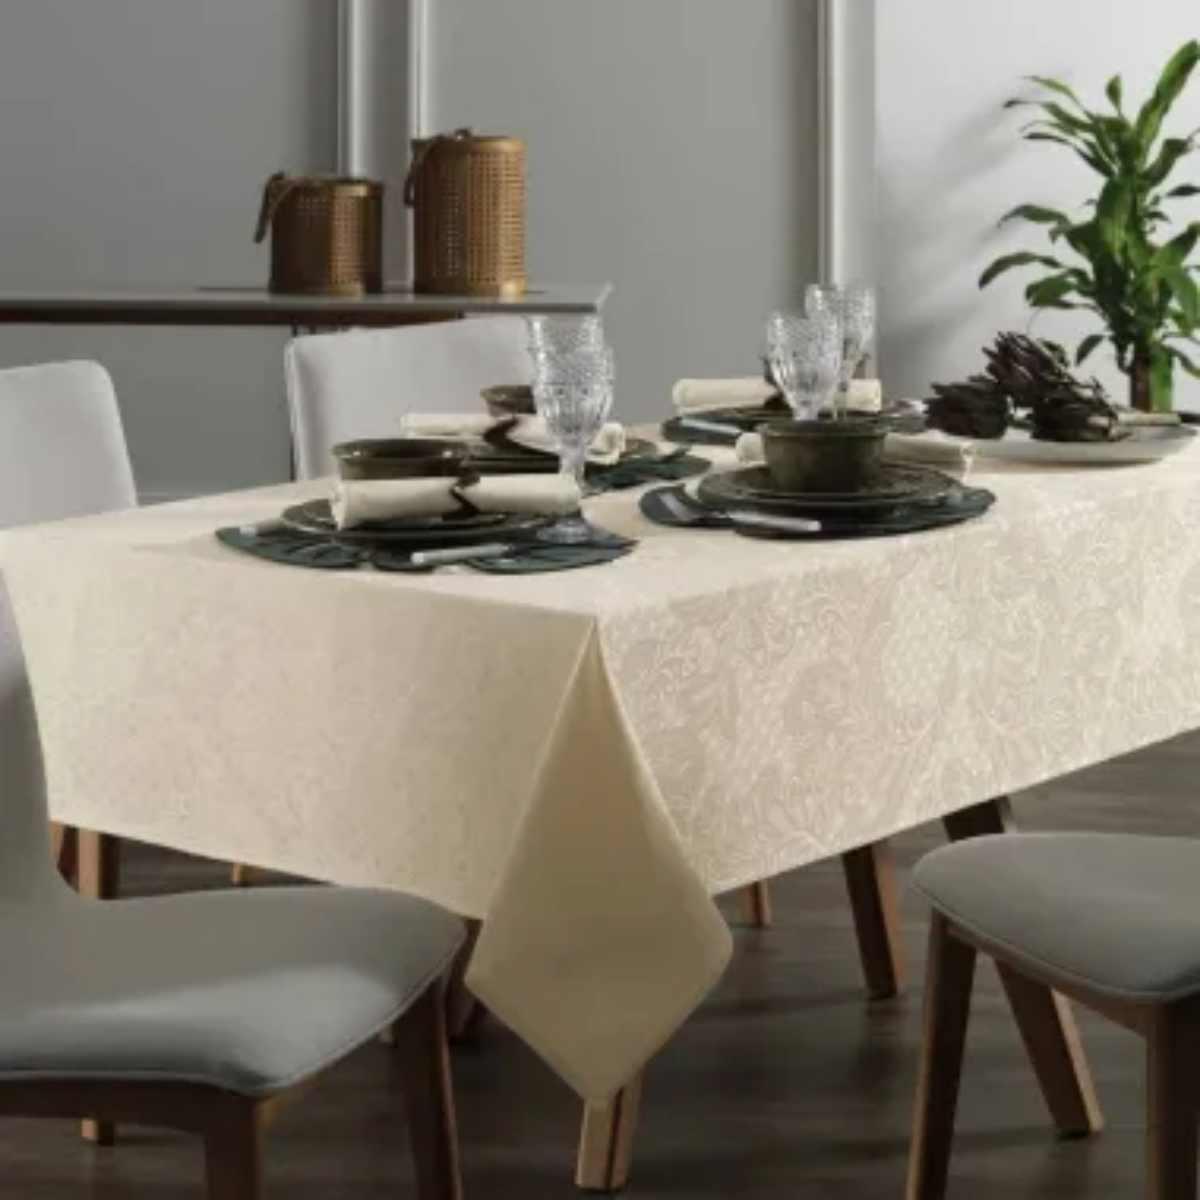 Toalha mesa sempre limpa jacquard  178rd Mendi Natural